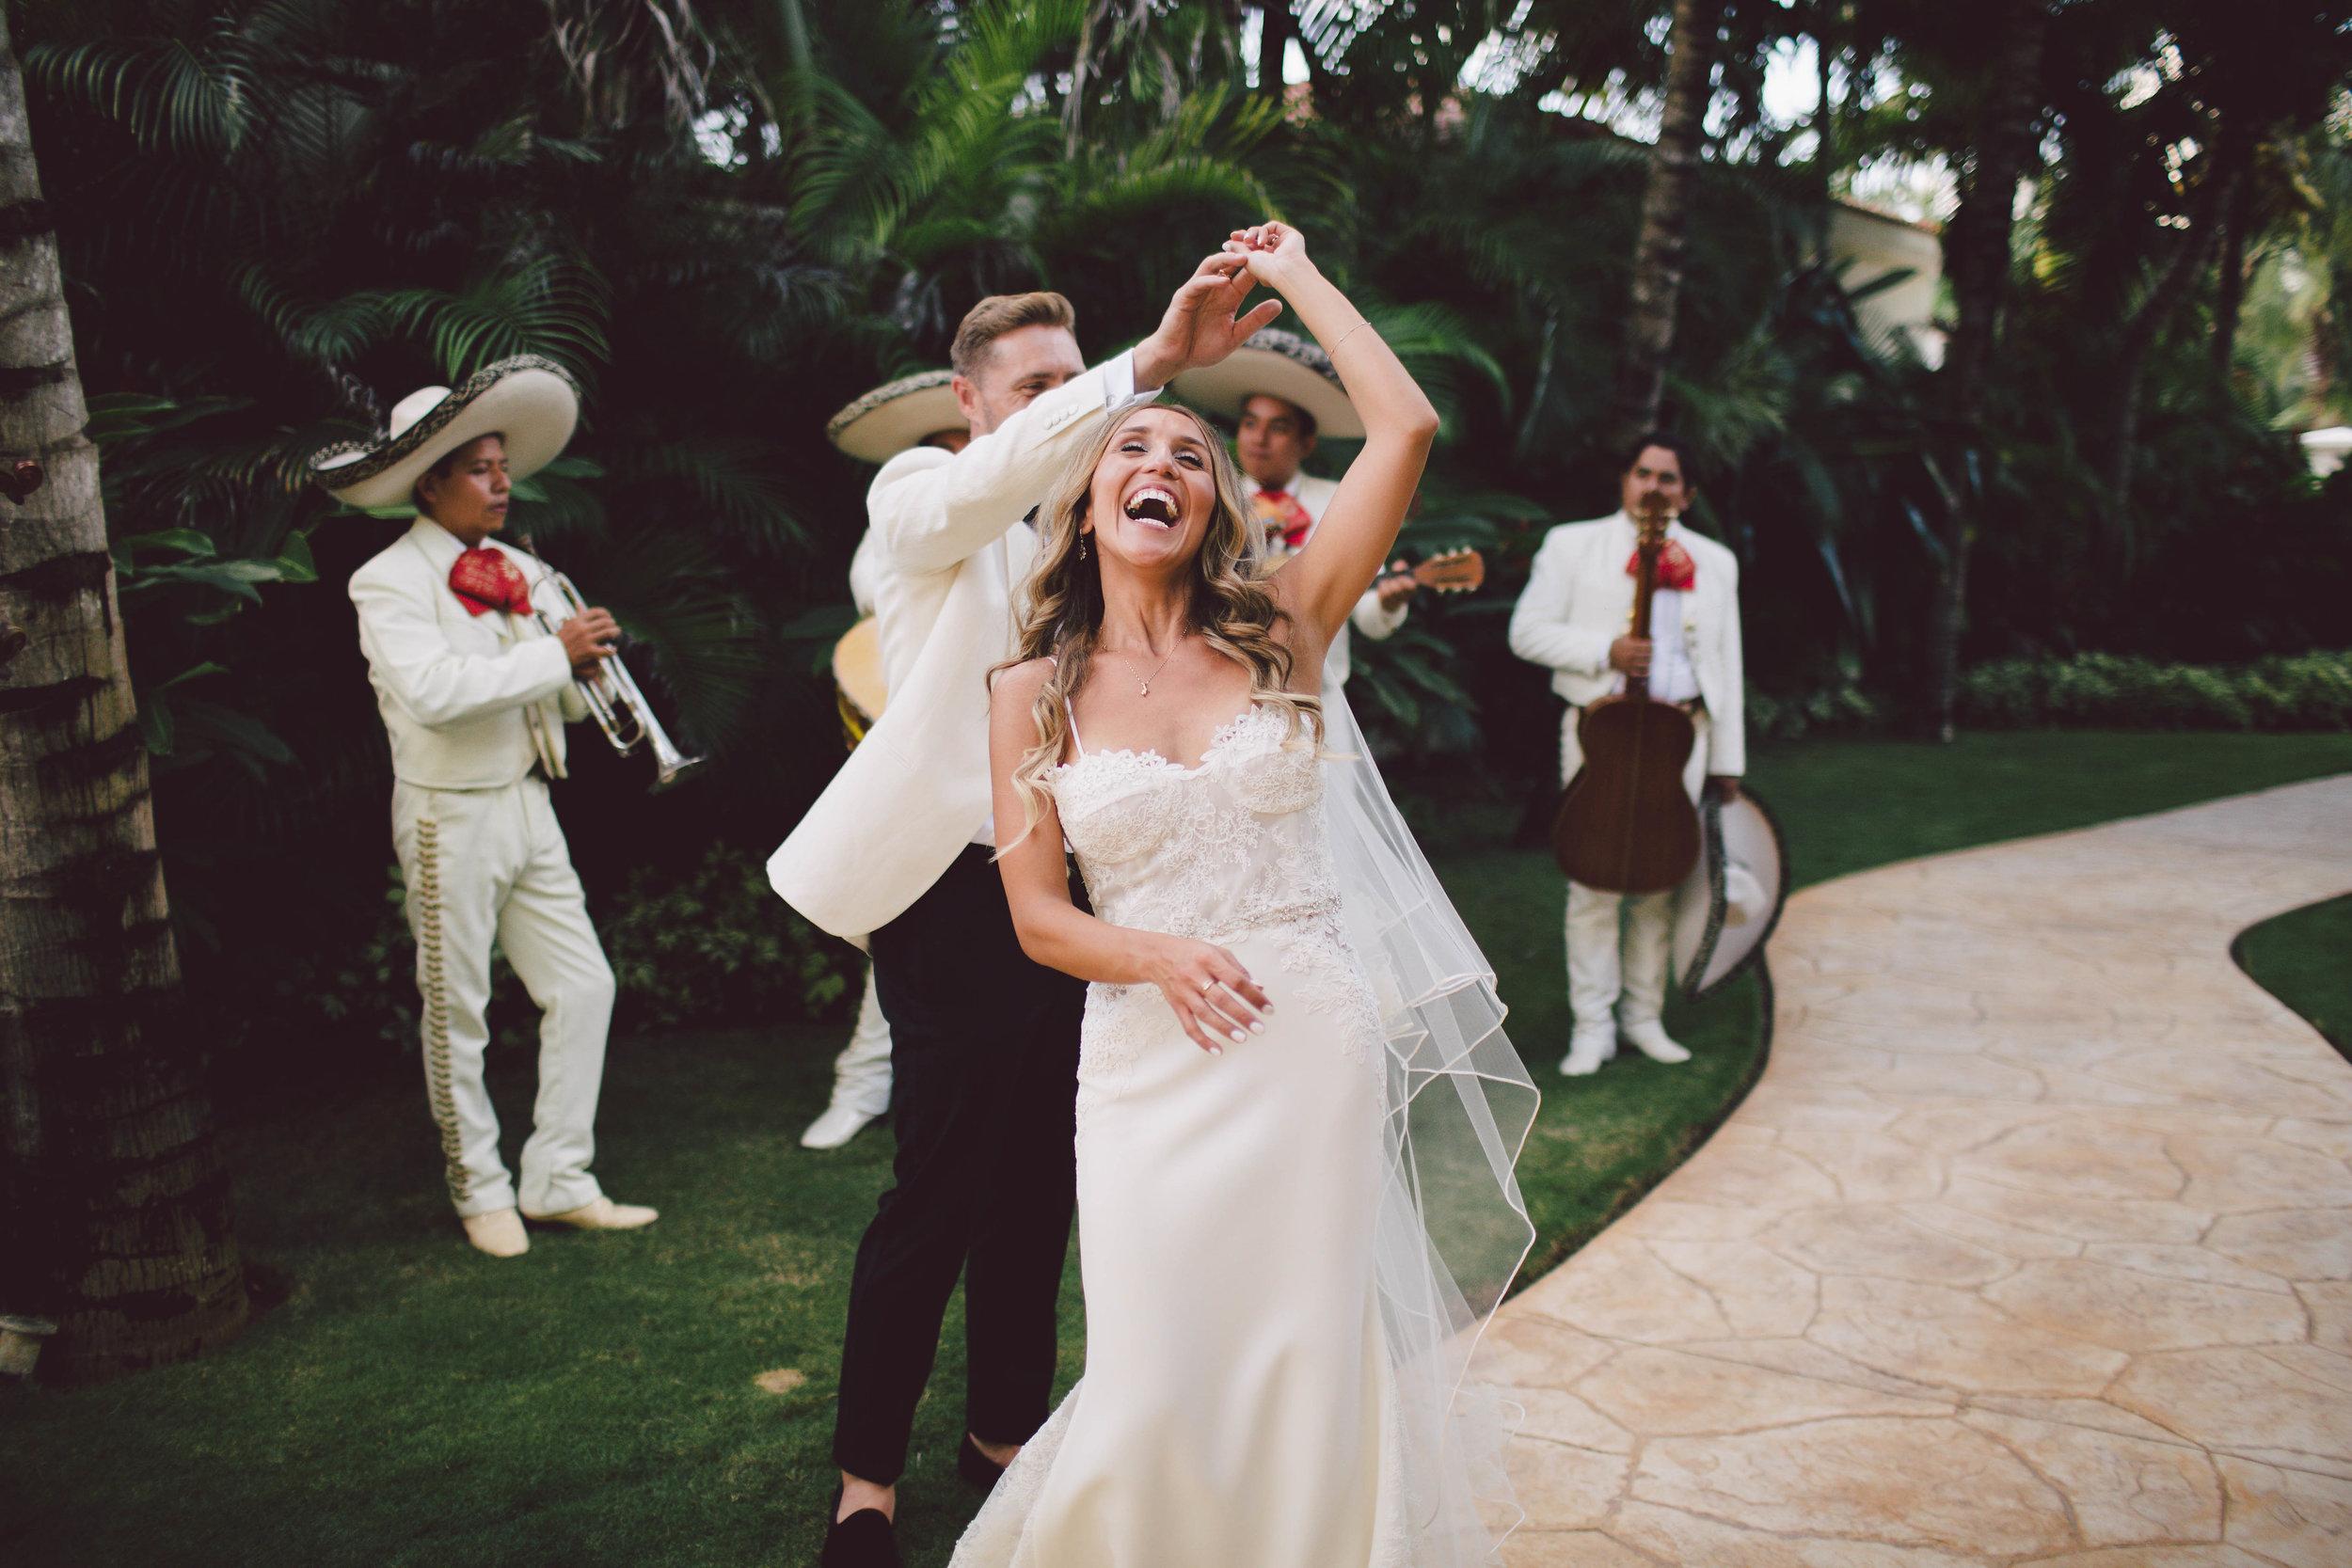 mexico_wedding_cancun_villa_la_joya_evangeline_lane_104.jpg